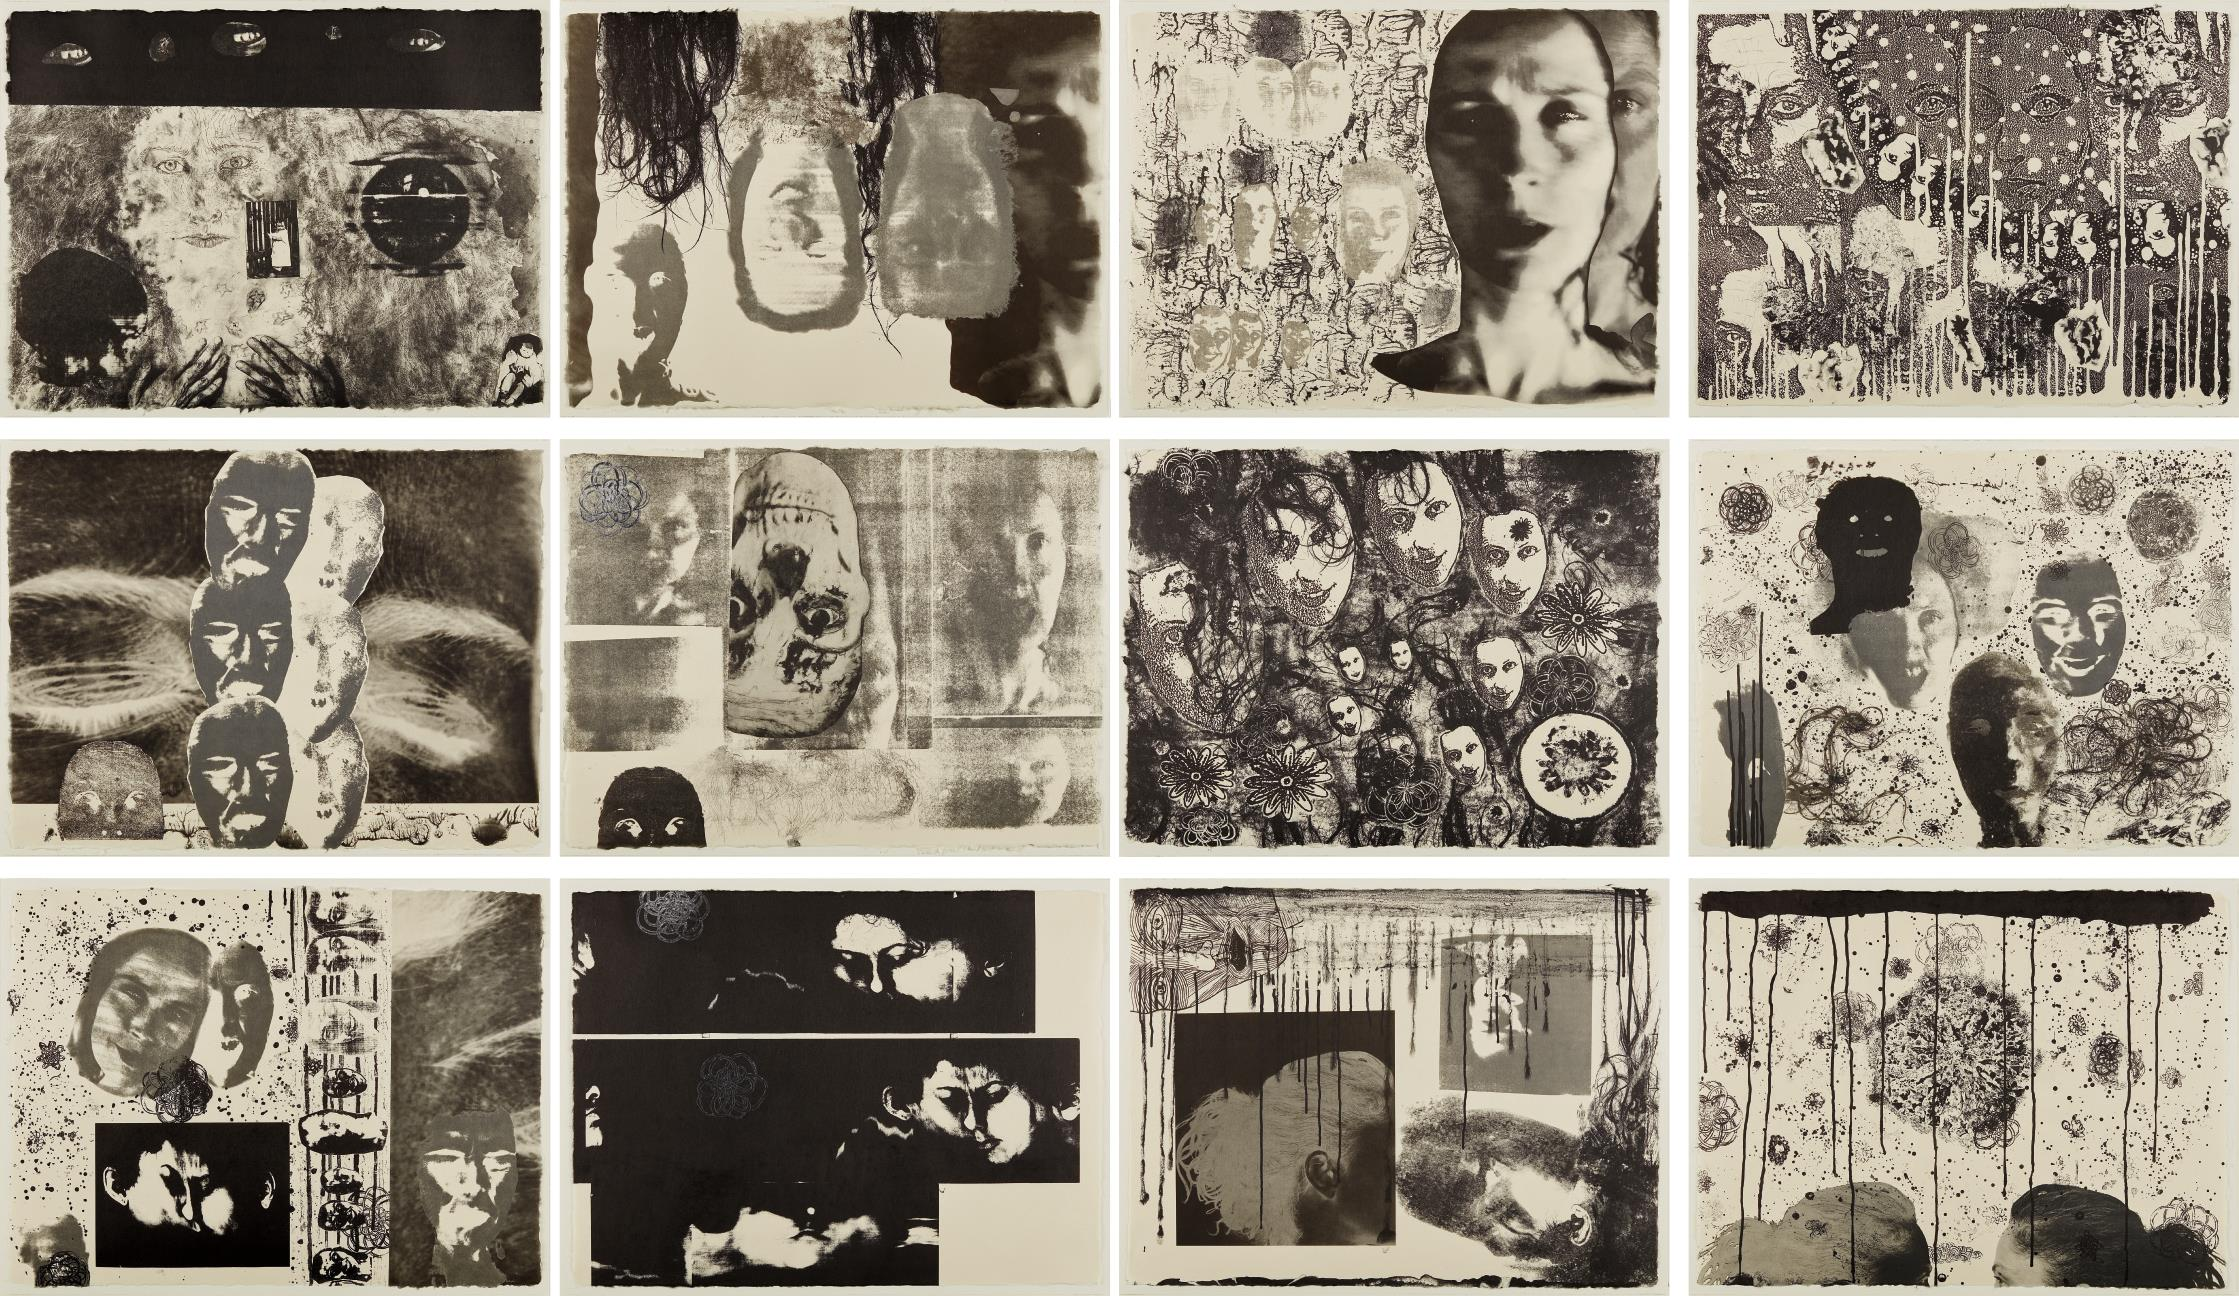 Kiki Smith-Banshee Pearls-1991